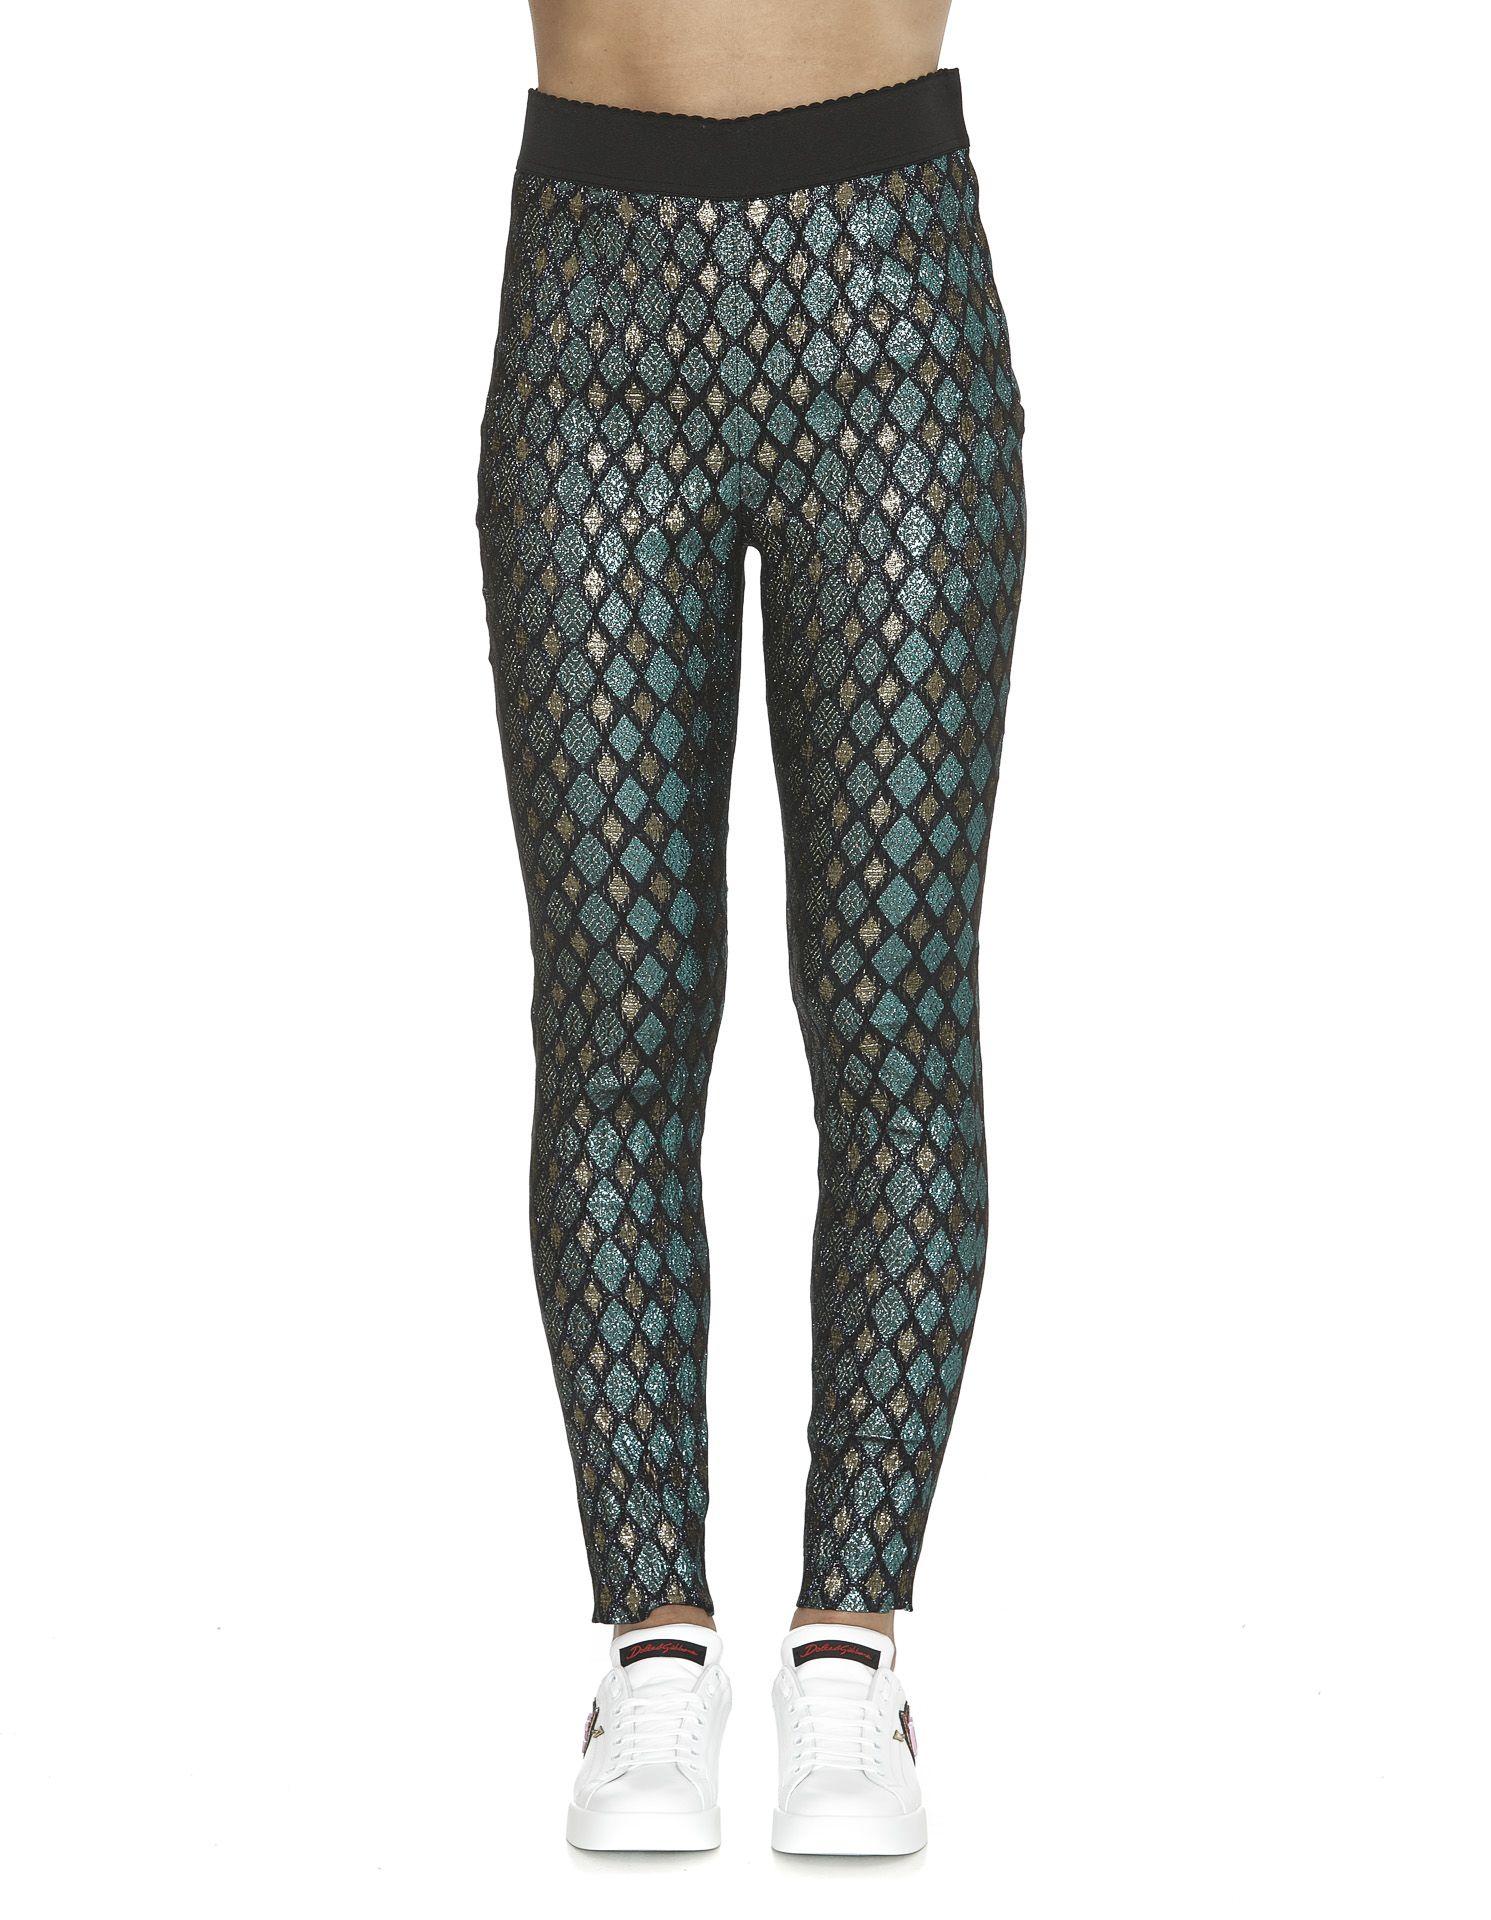 Dolce & Gabbana Jacquard Trousers